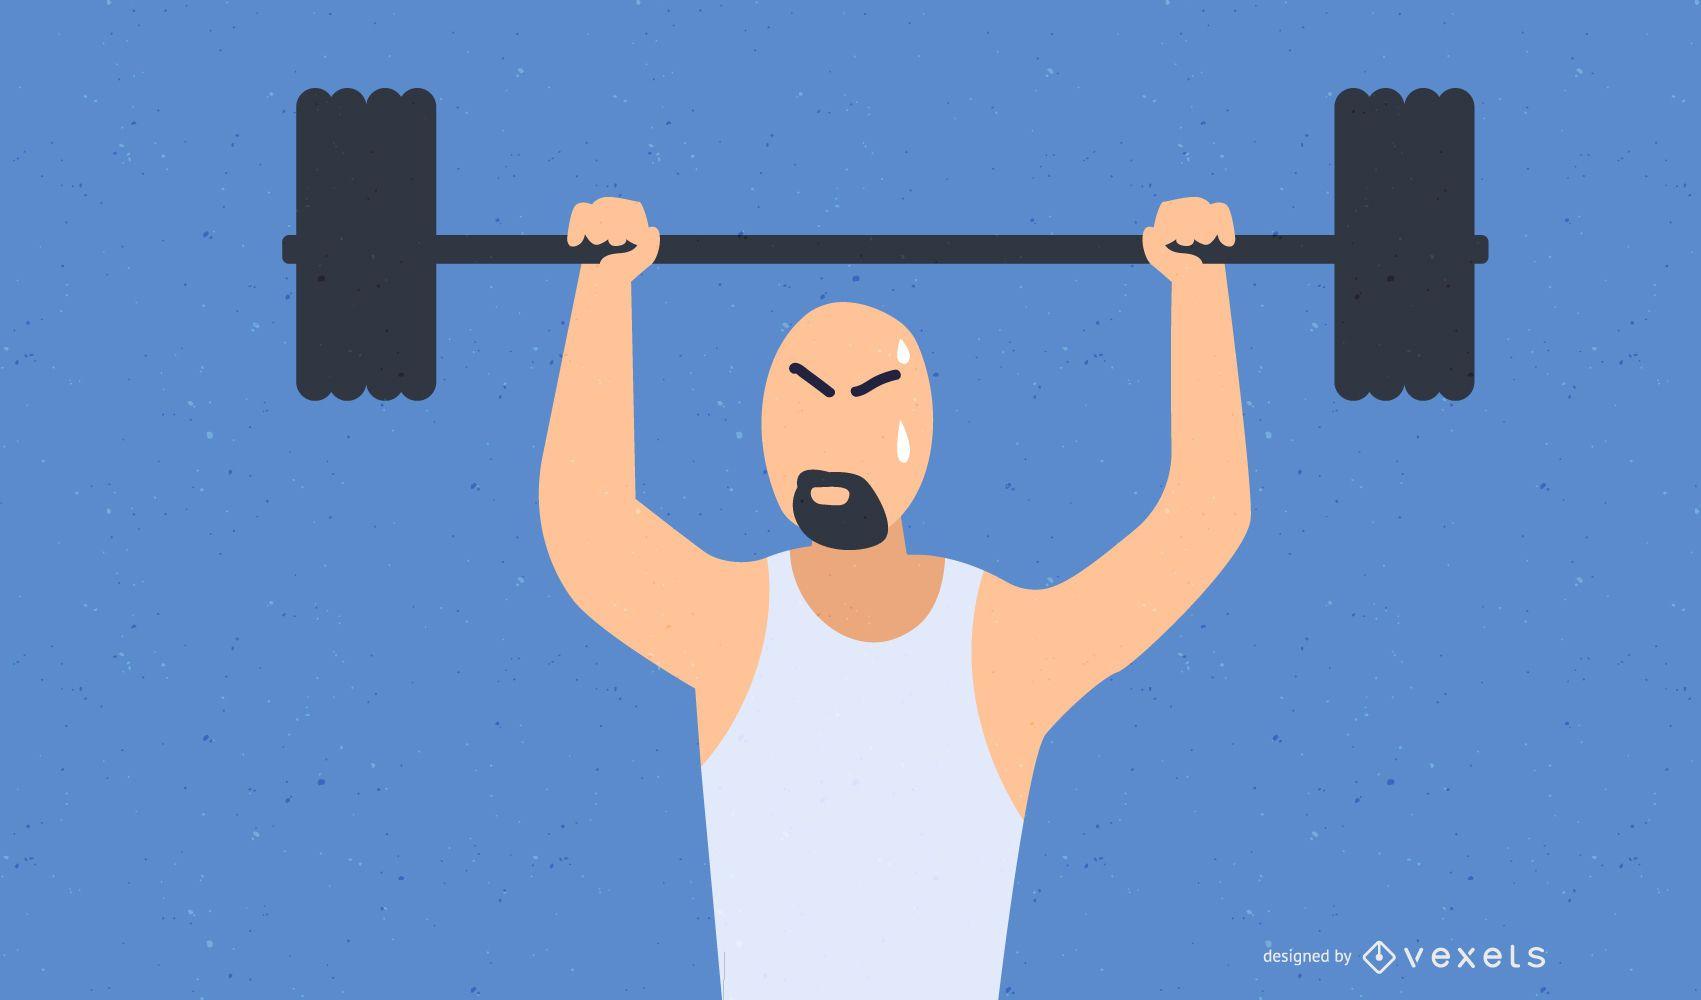 Sweating man illlustration